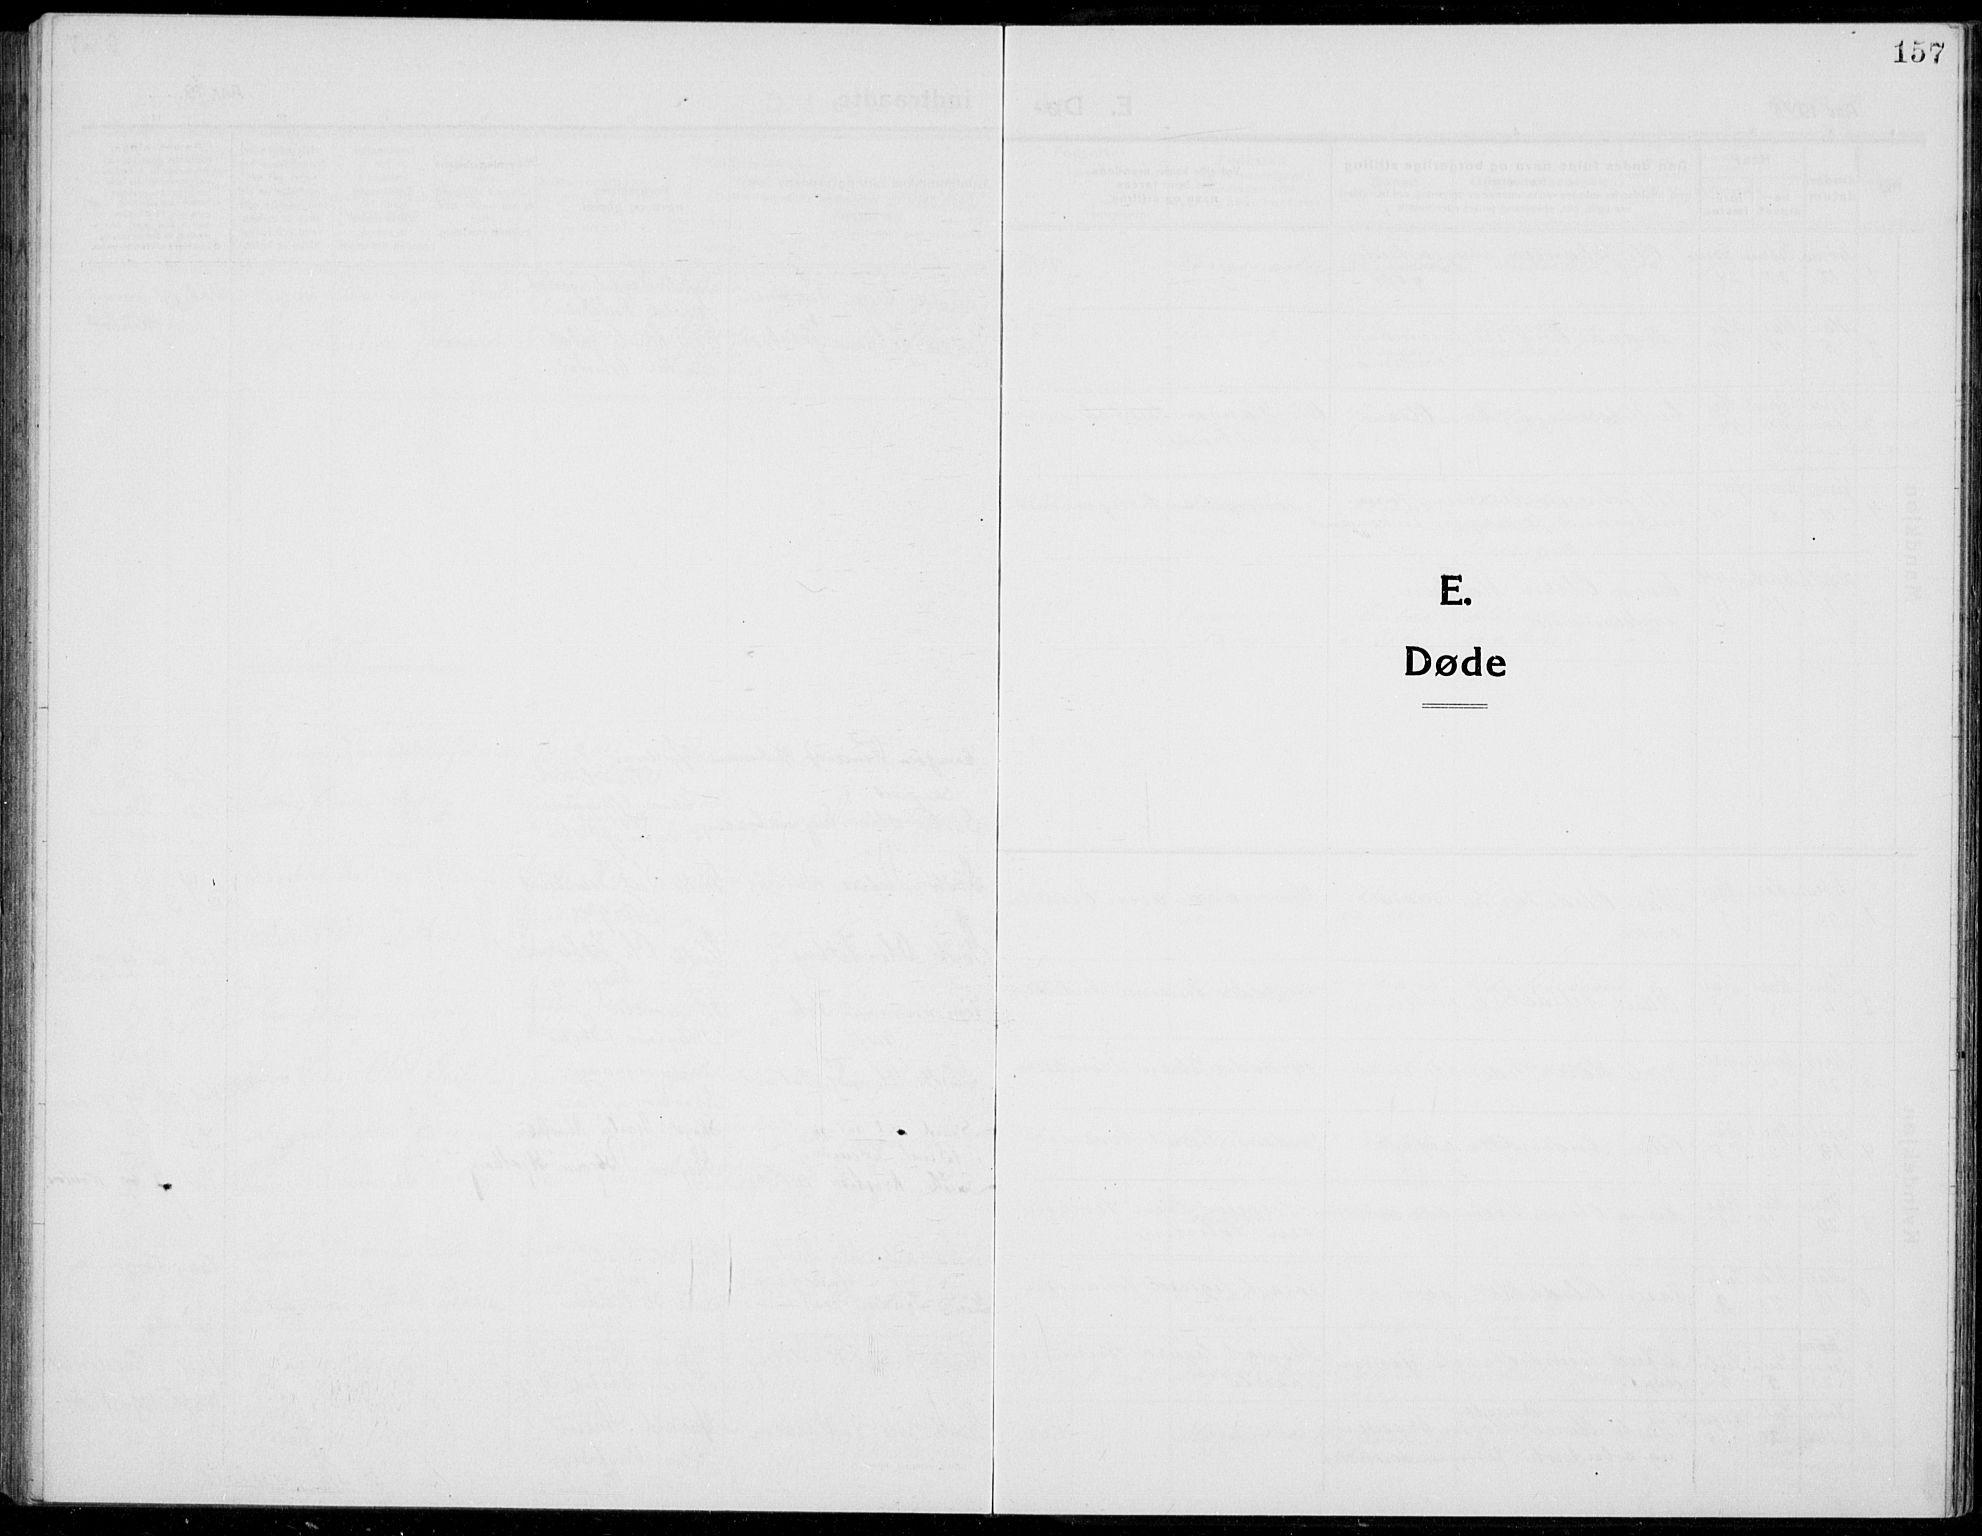 SAH, Stange prestekontor, L/L0017: Parish register (copy) no. 17, 1918-1936, p. 157